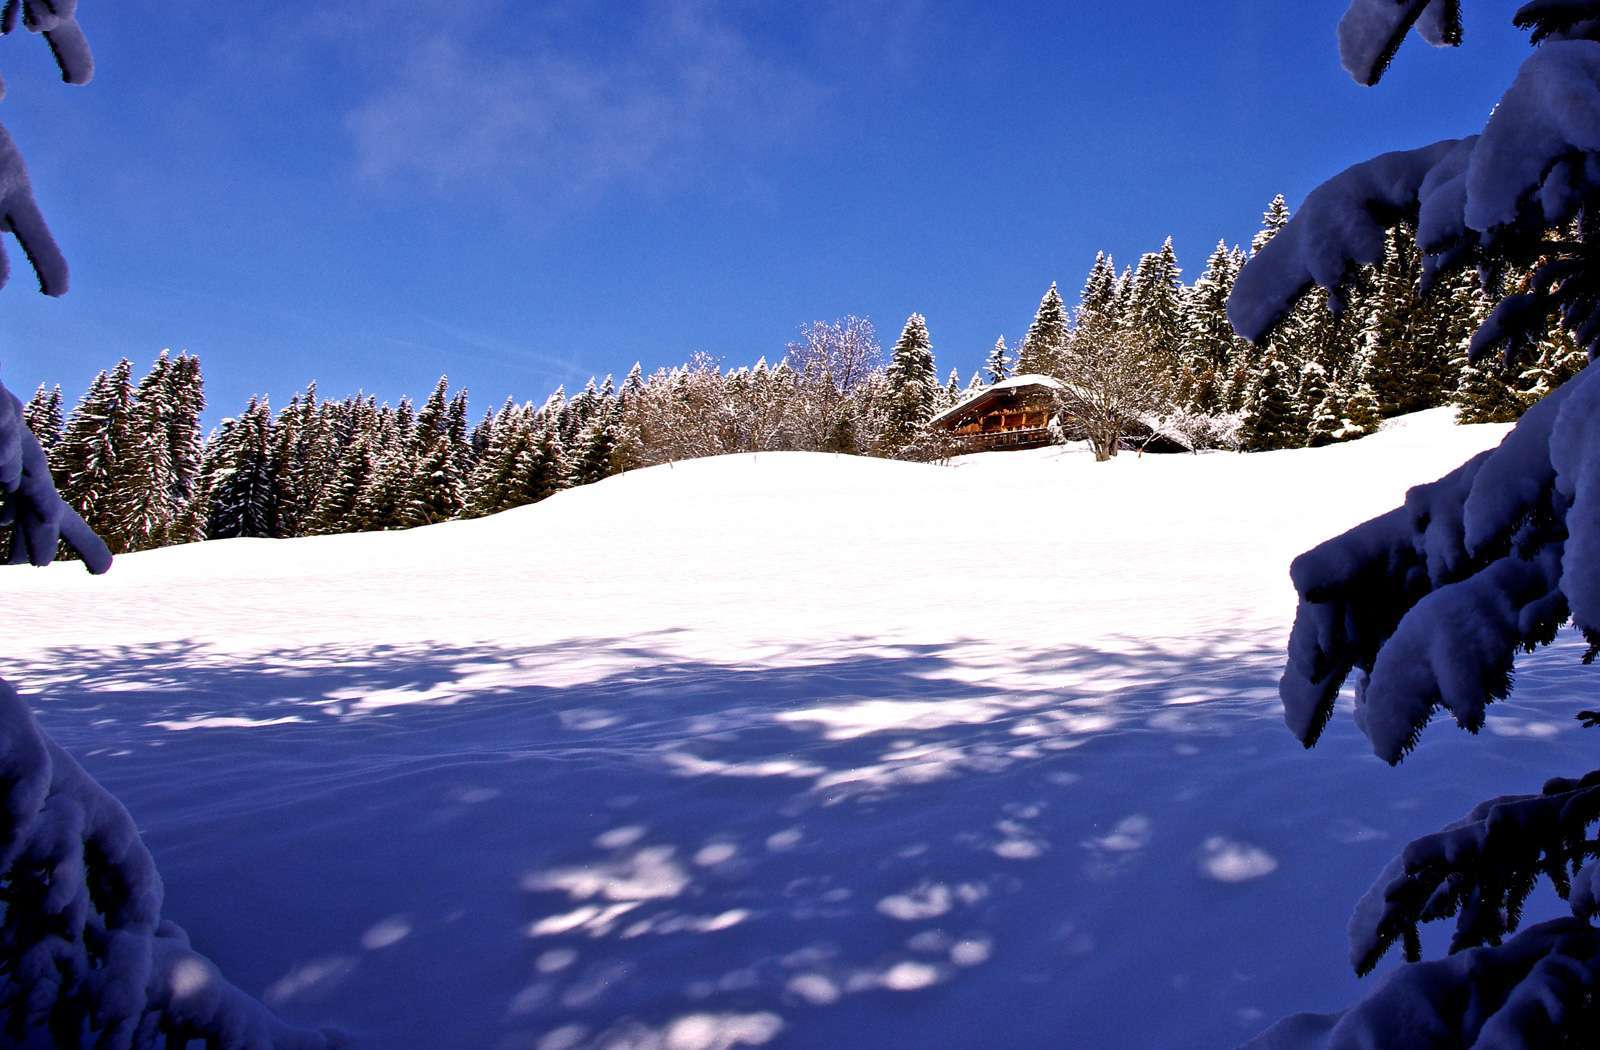 Kings-avenue-méribel-snow-sauna-jacuzzi-hammam-childfriendly-parking-fireplace-ski-in-helipad-area-méribel-014